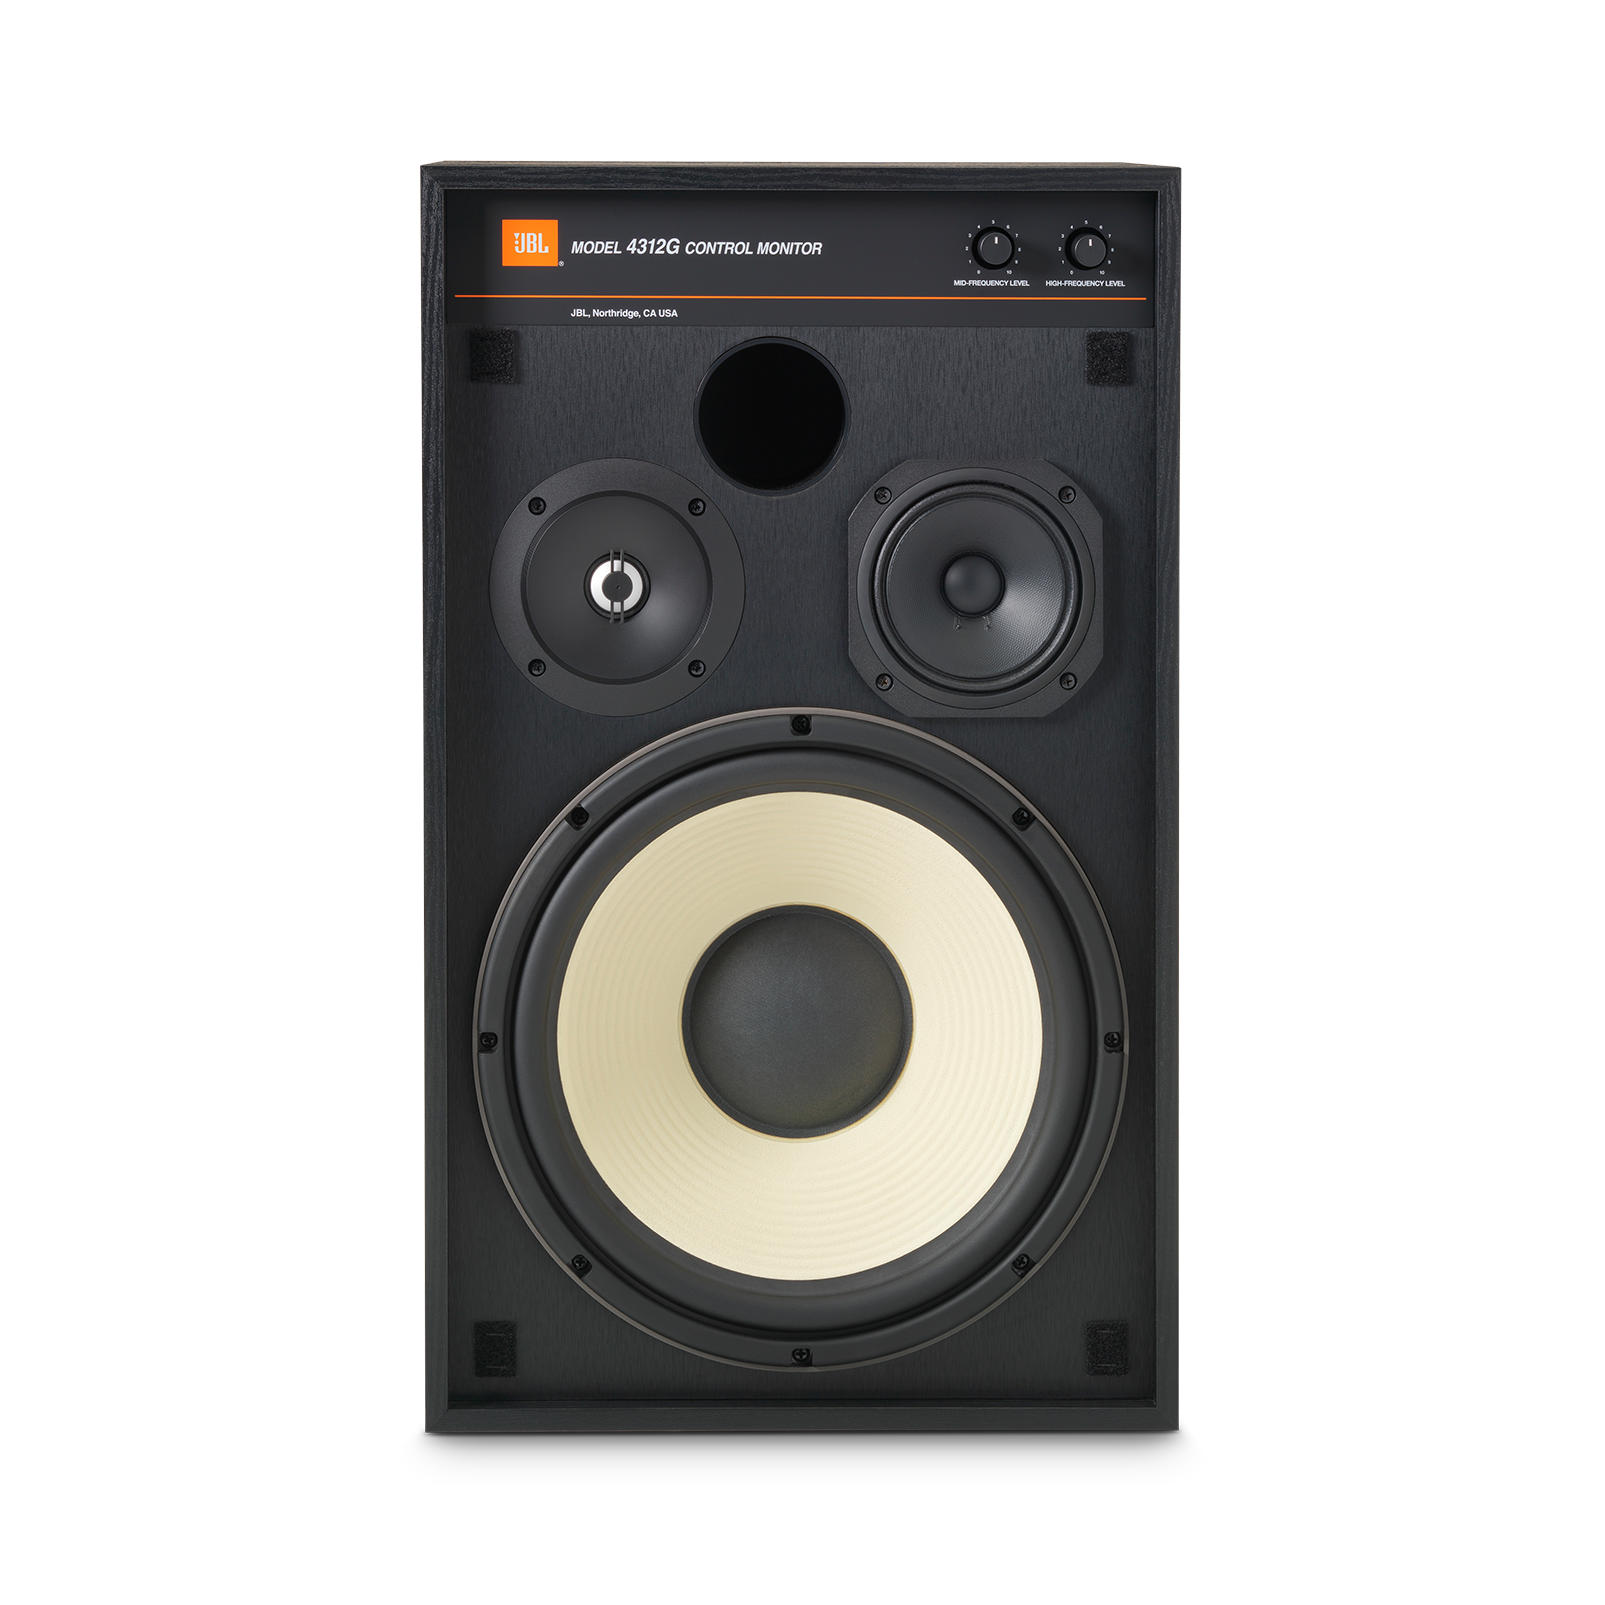 4312G - Black - 12-inch (300mm) 3-way Studio Monitor Bookshelf Loudspeaker - Detailshot 1